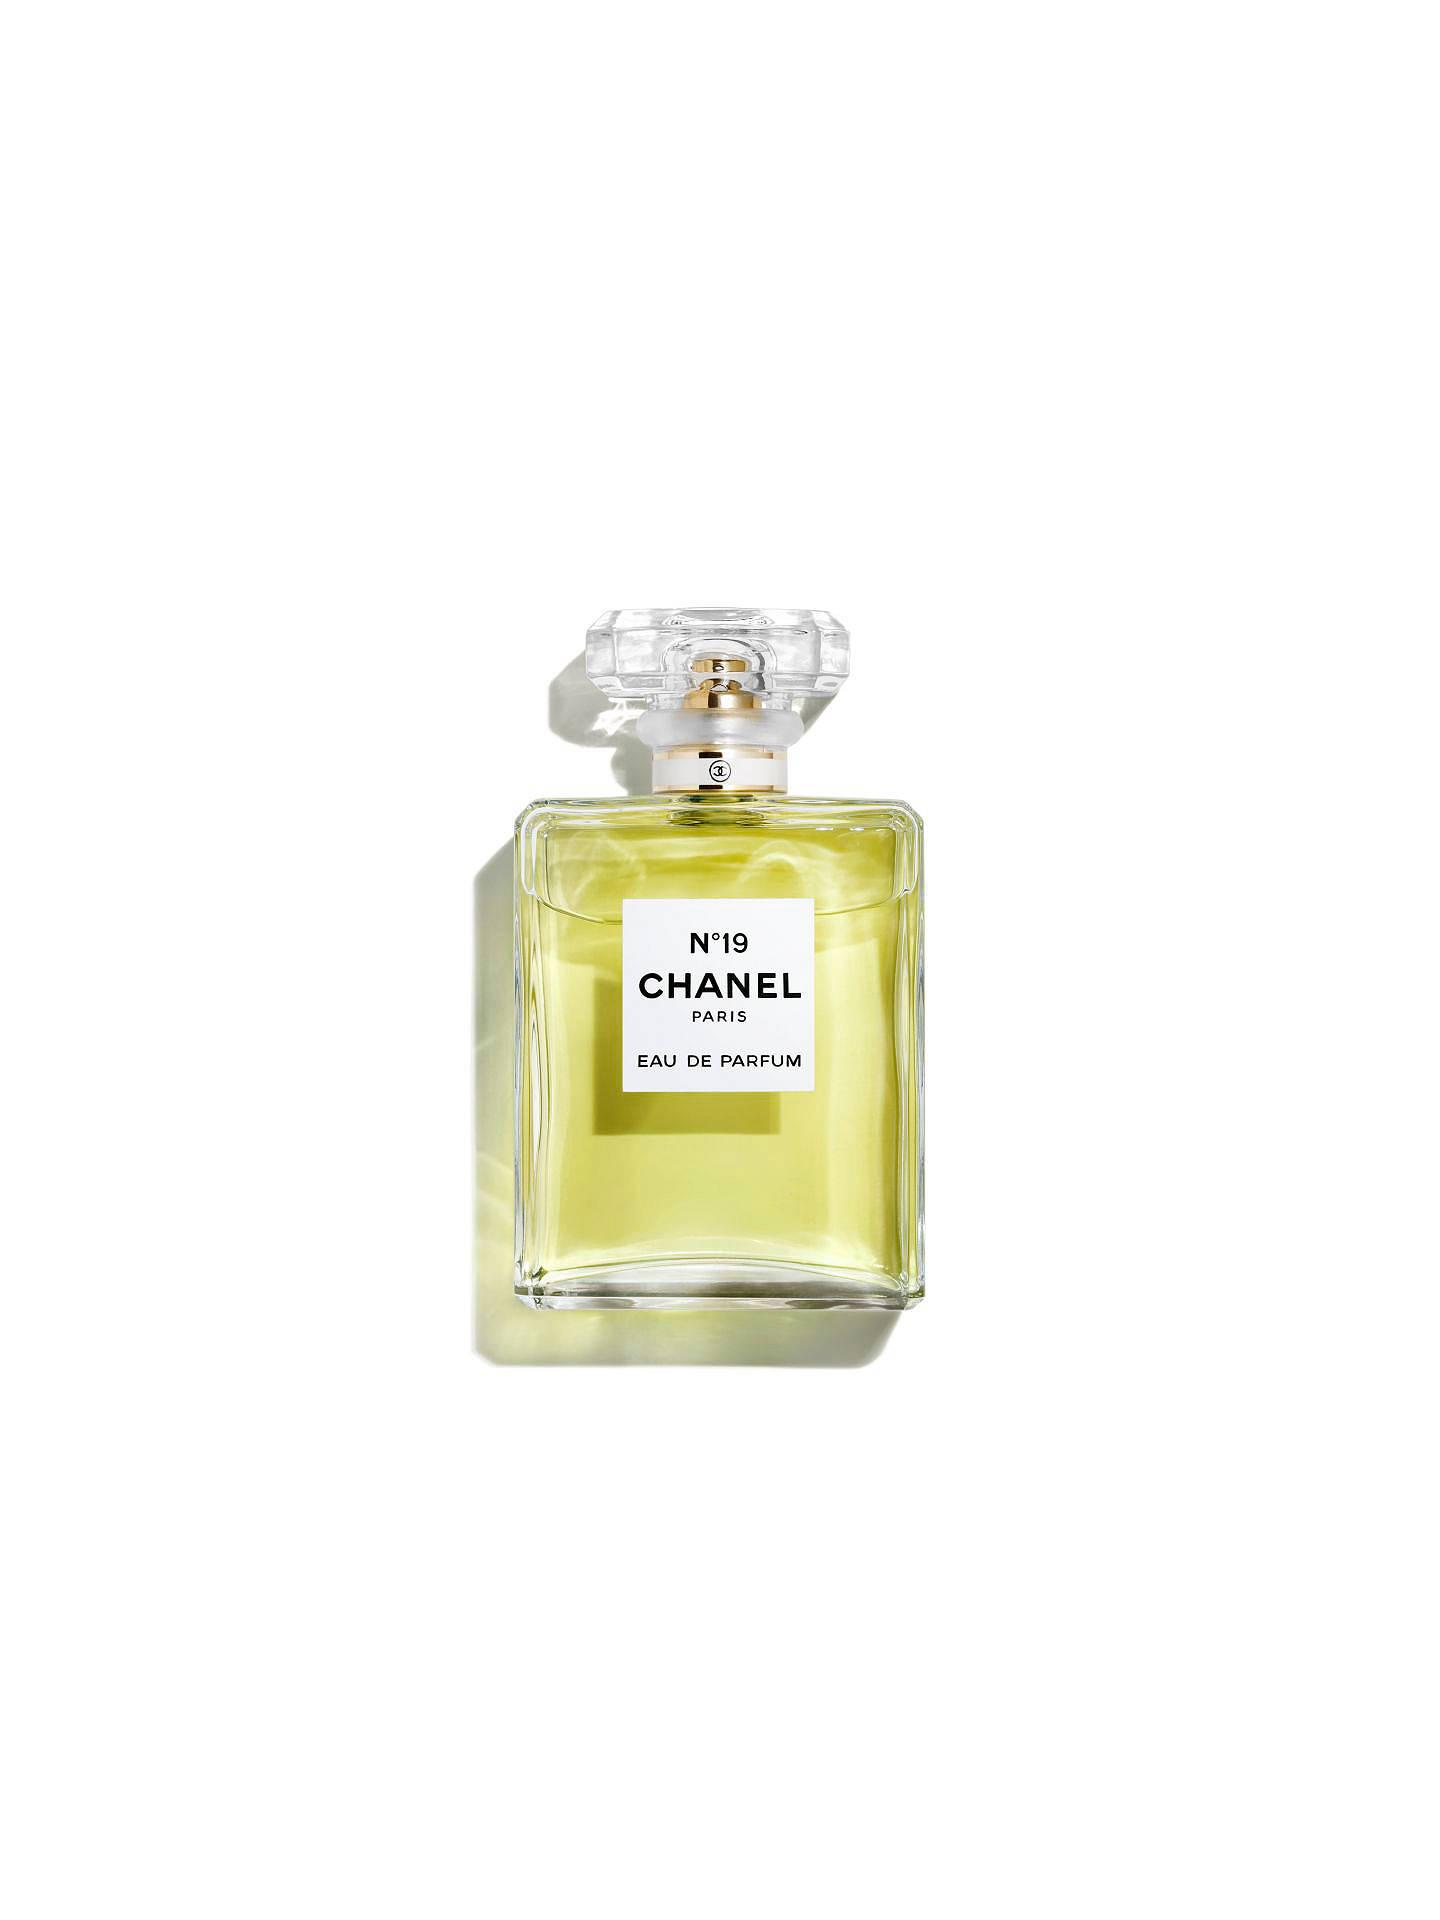 aa764733409 CHANEL N°19 Eau de Parfum Spray at John Lewis   Partners